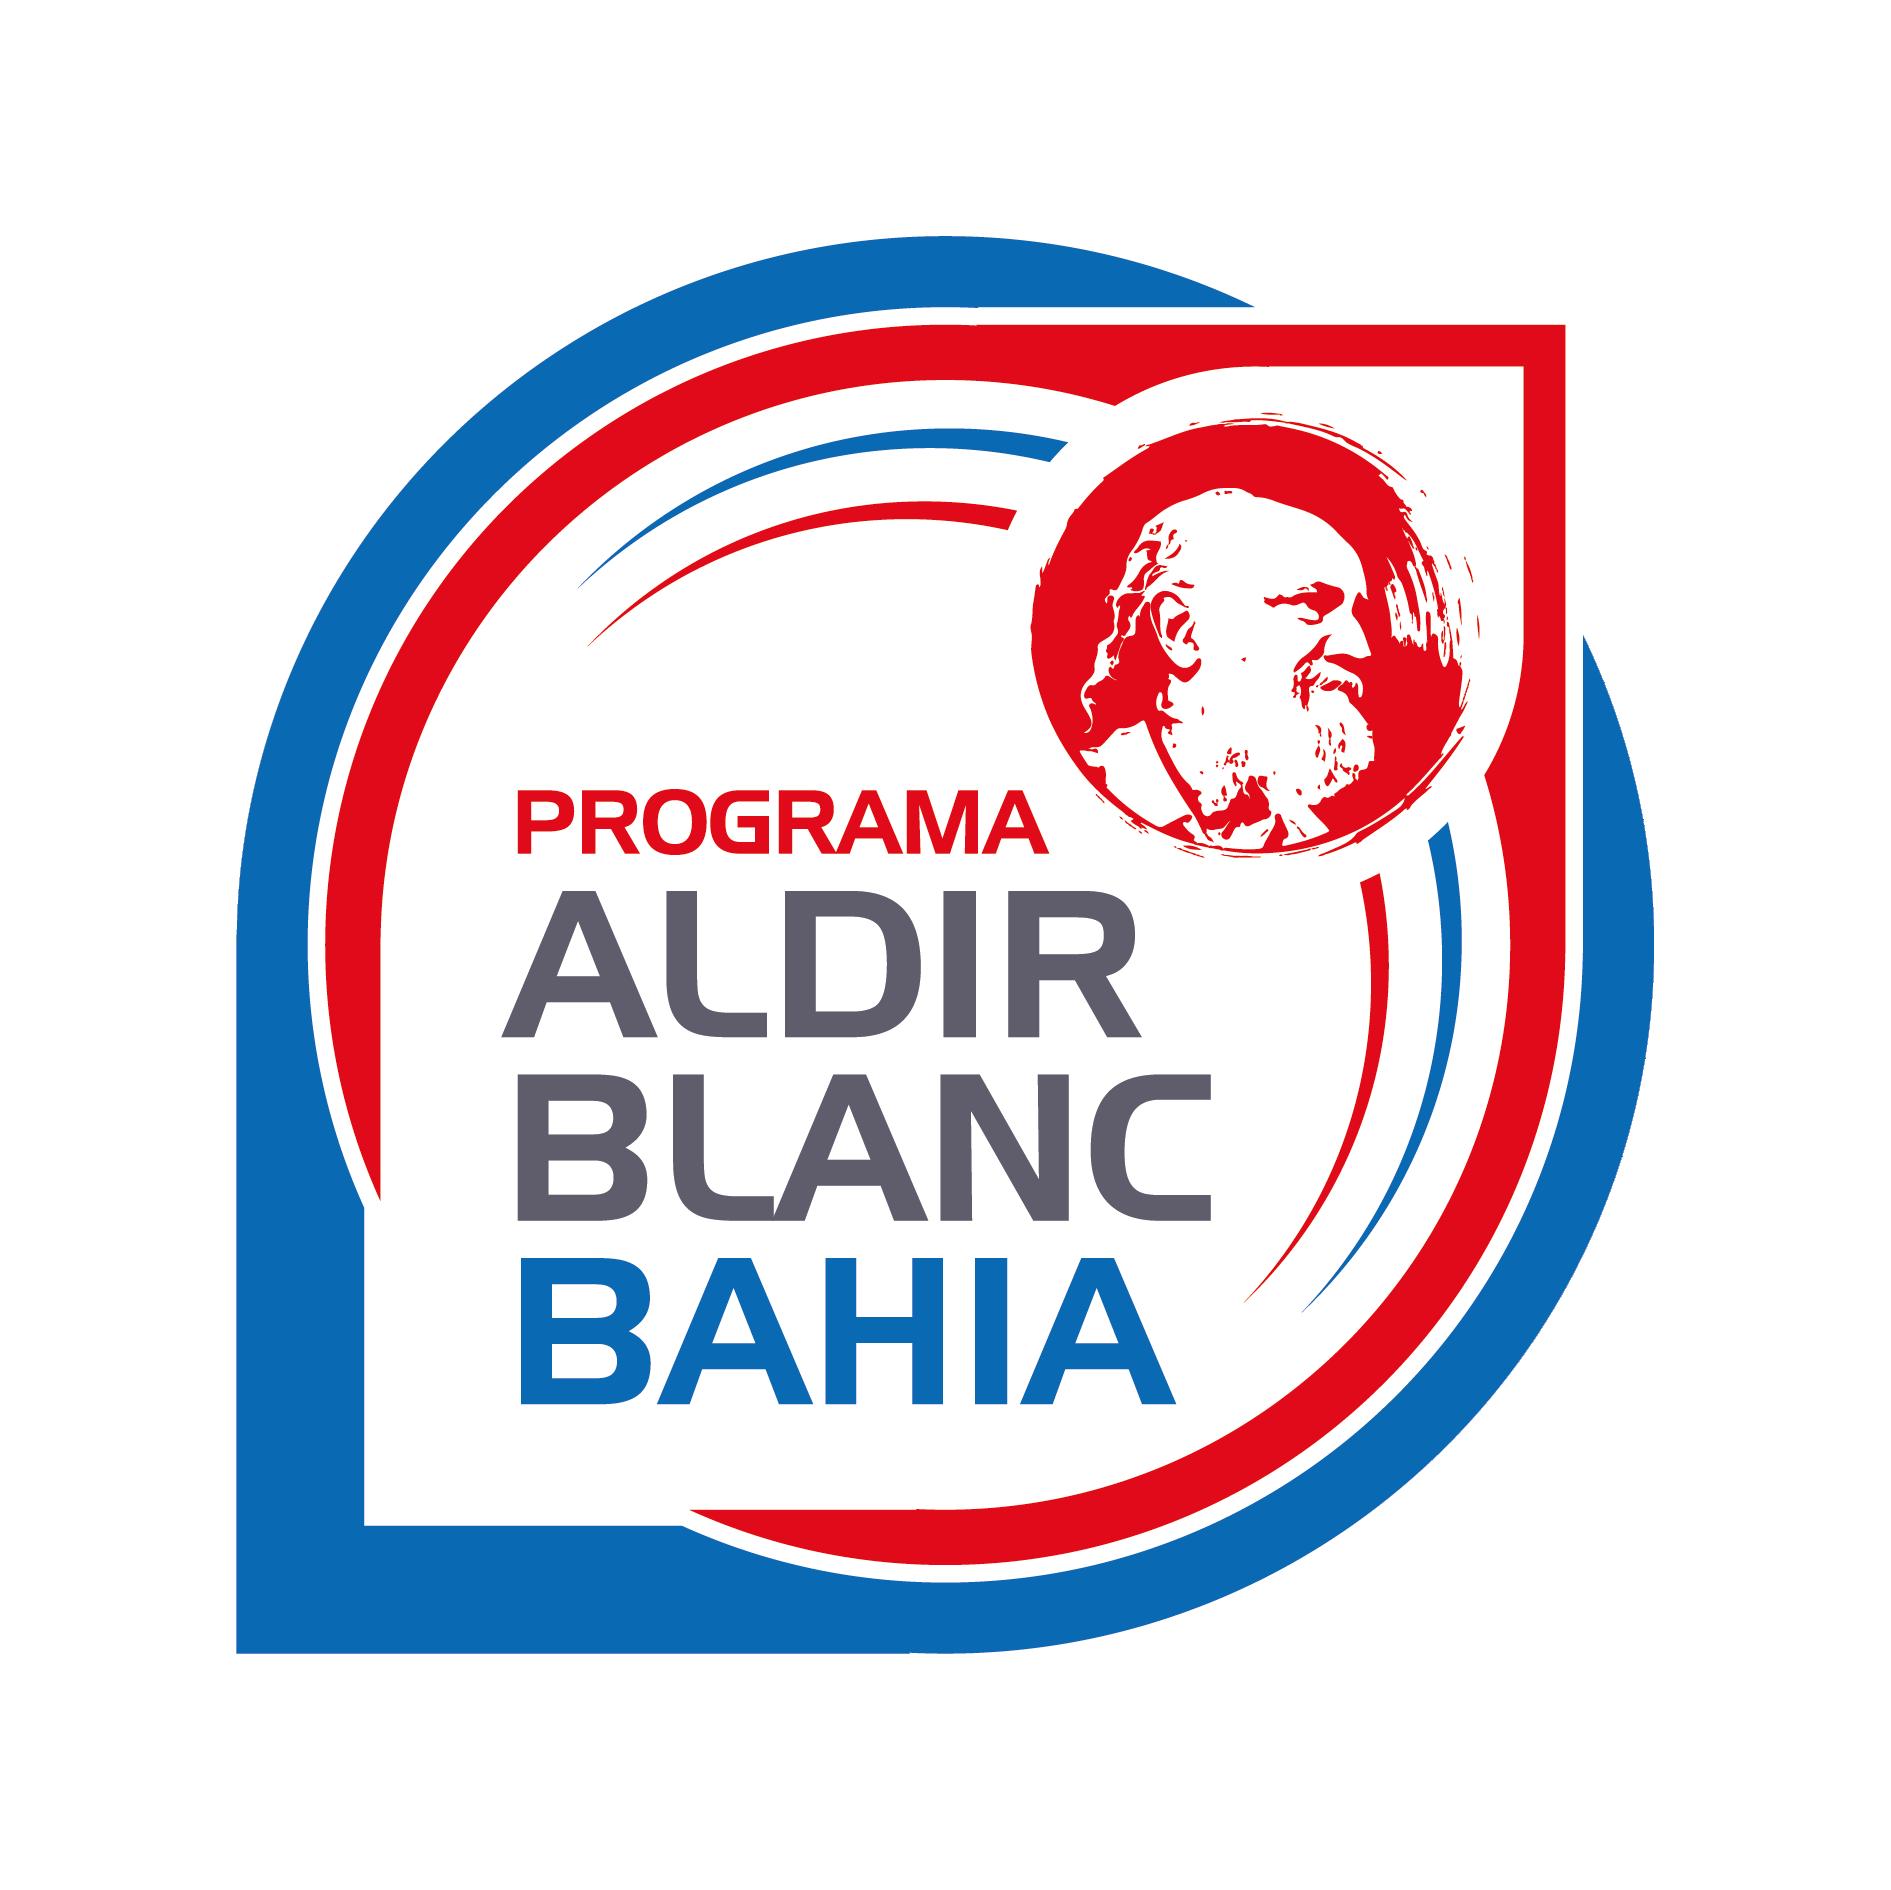 Lei Aldir Blanc na Bahia